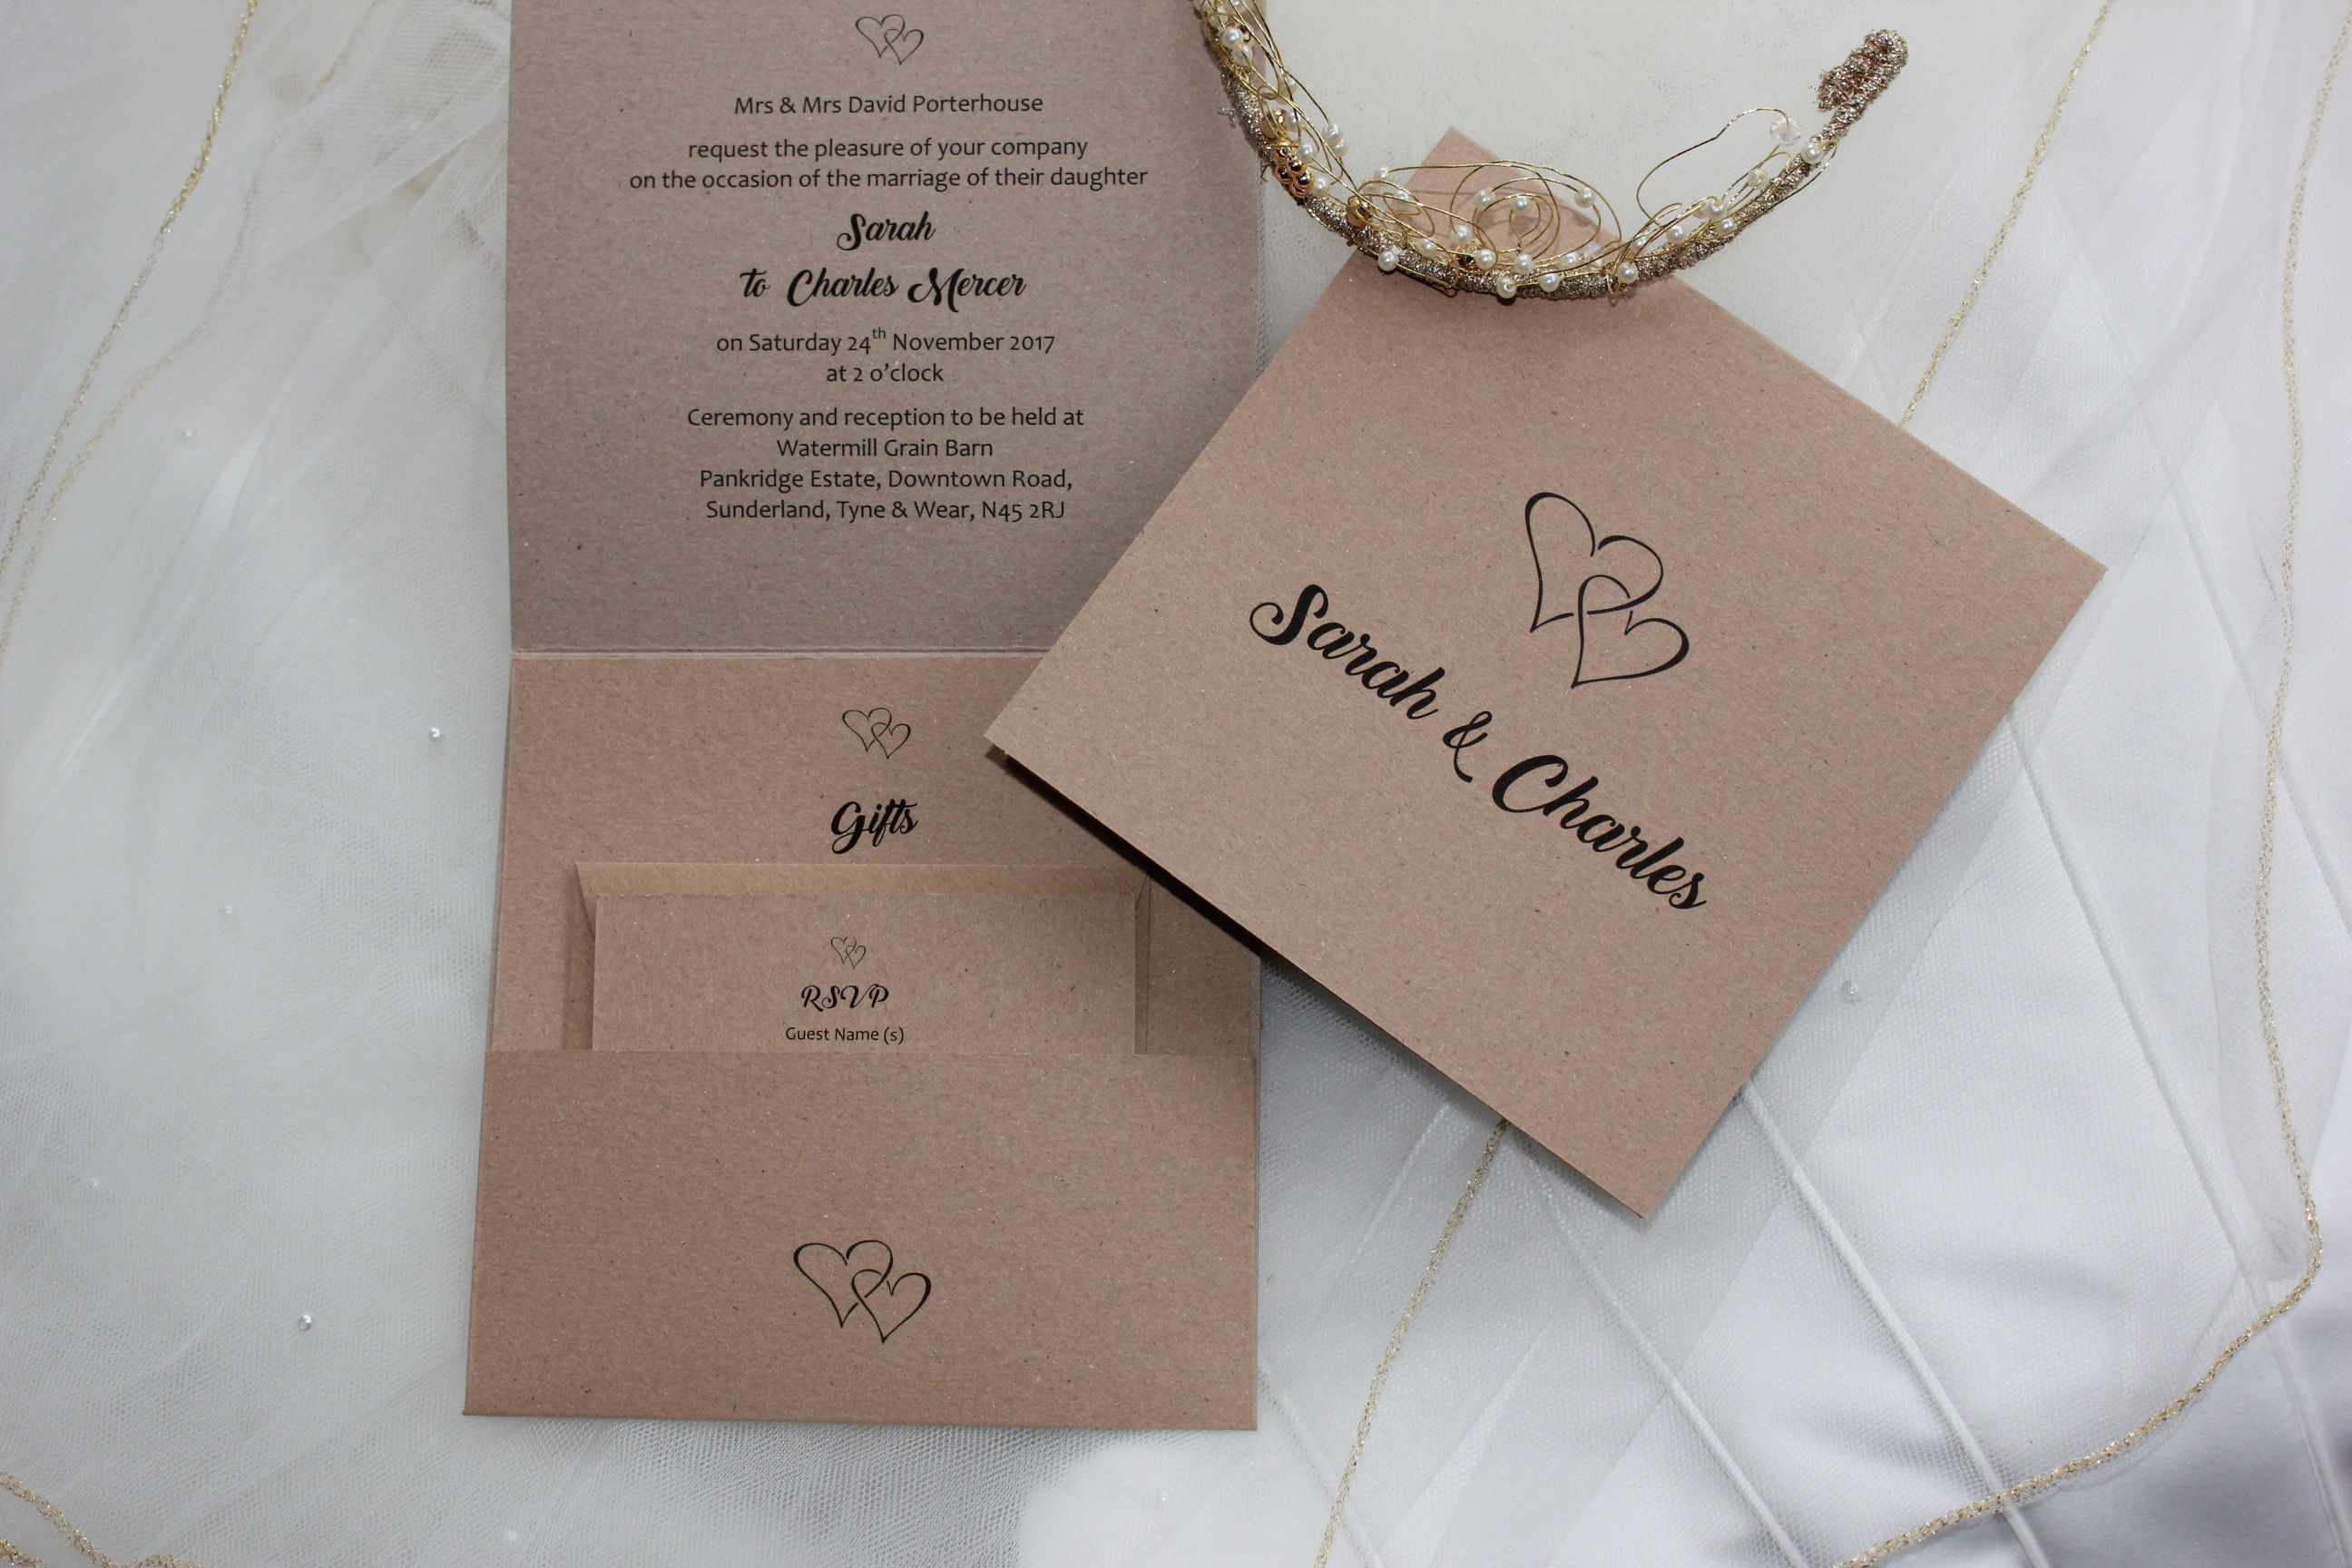 New Wedding Invite Styles - Daisy Chain Invites